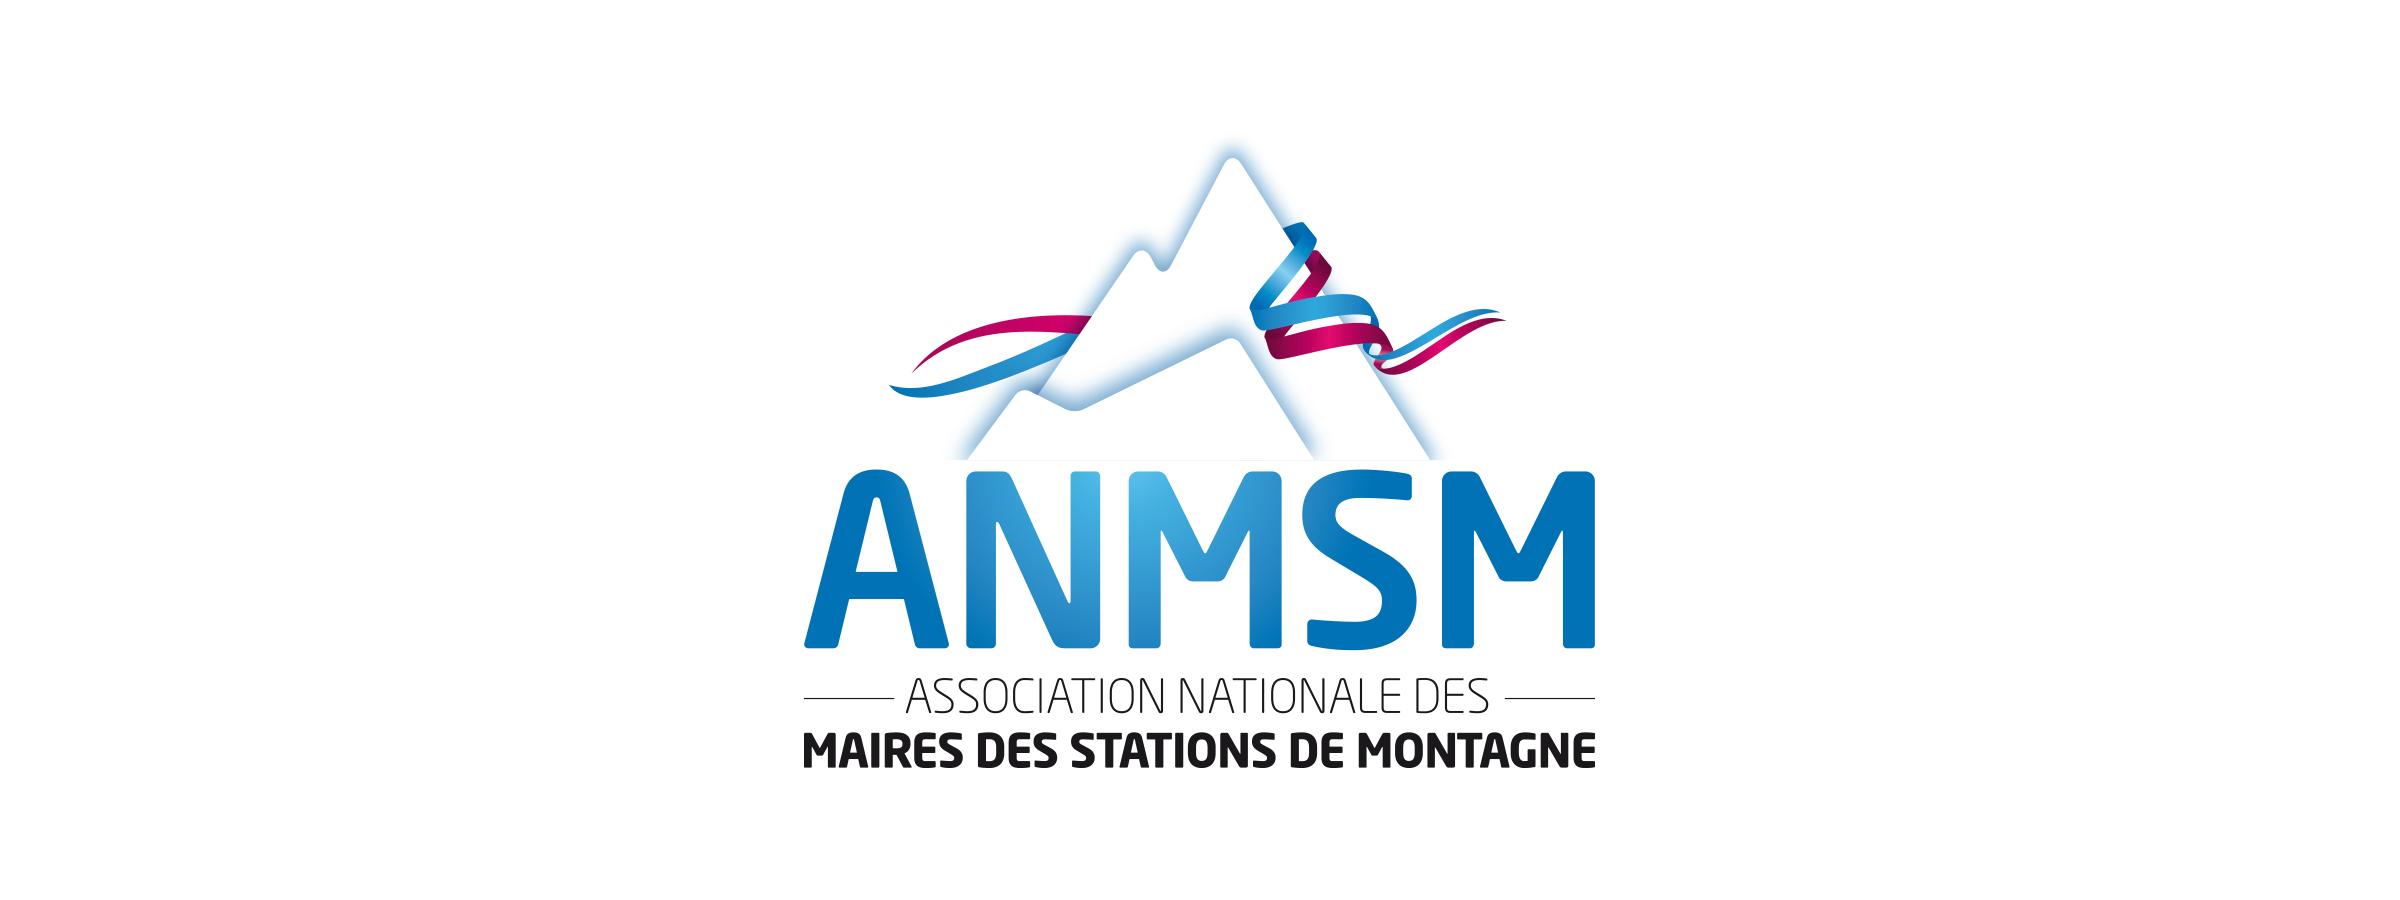 Logotype ANMSM